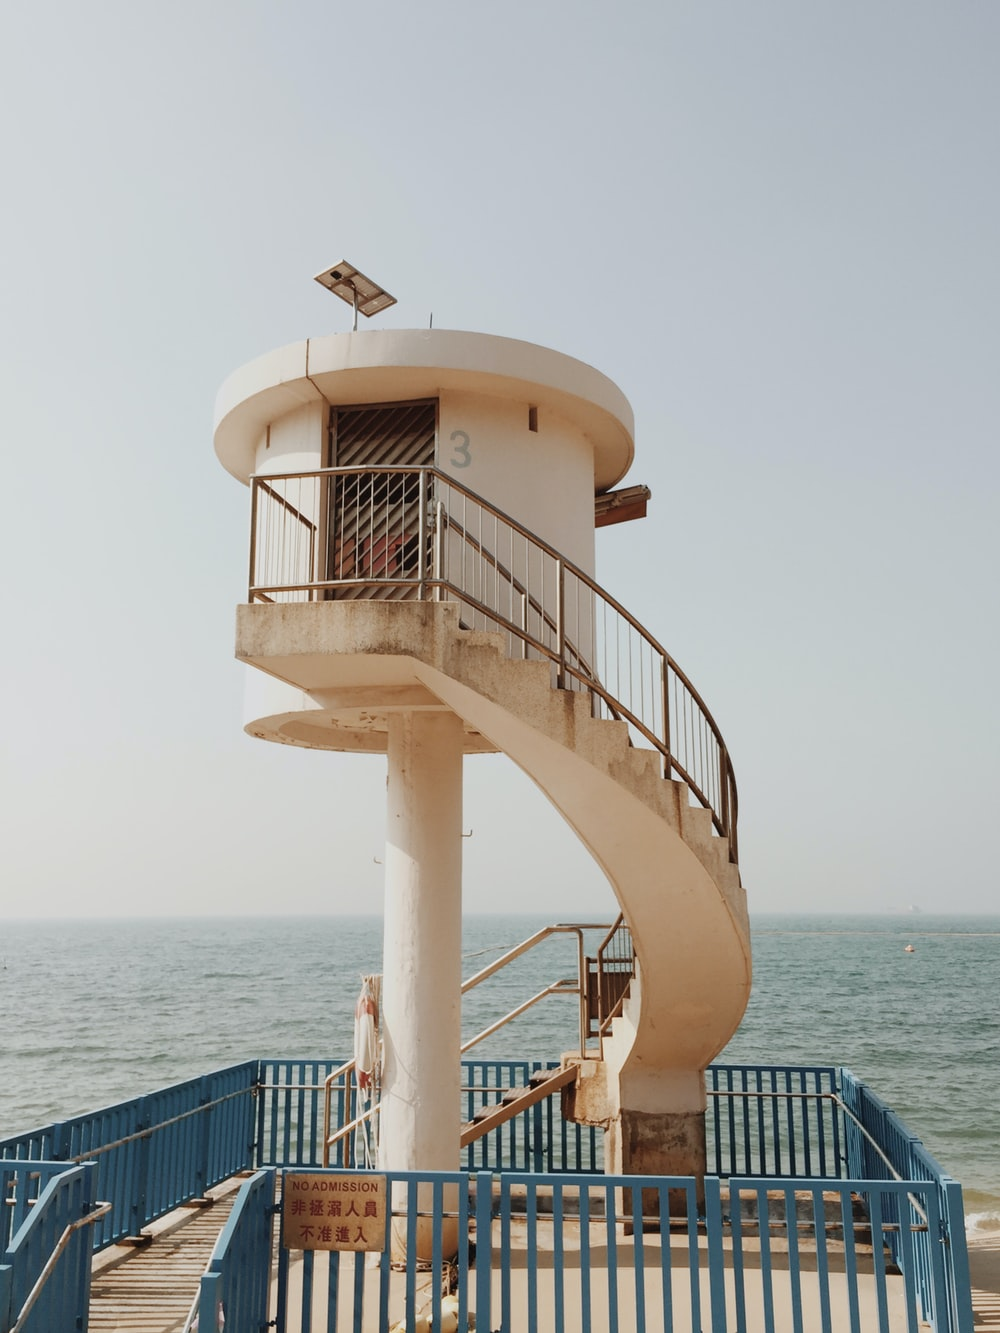 round tower near body of water